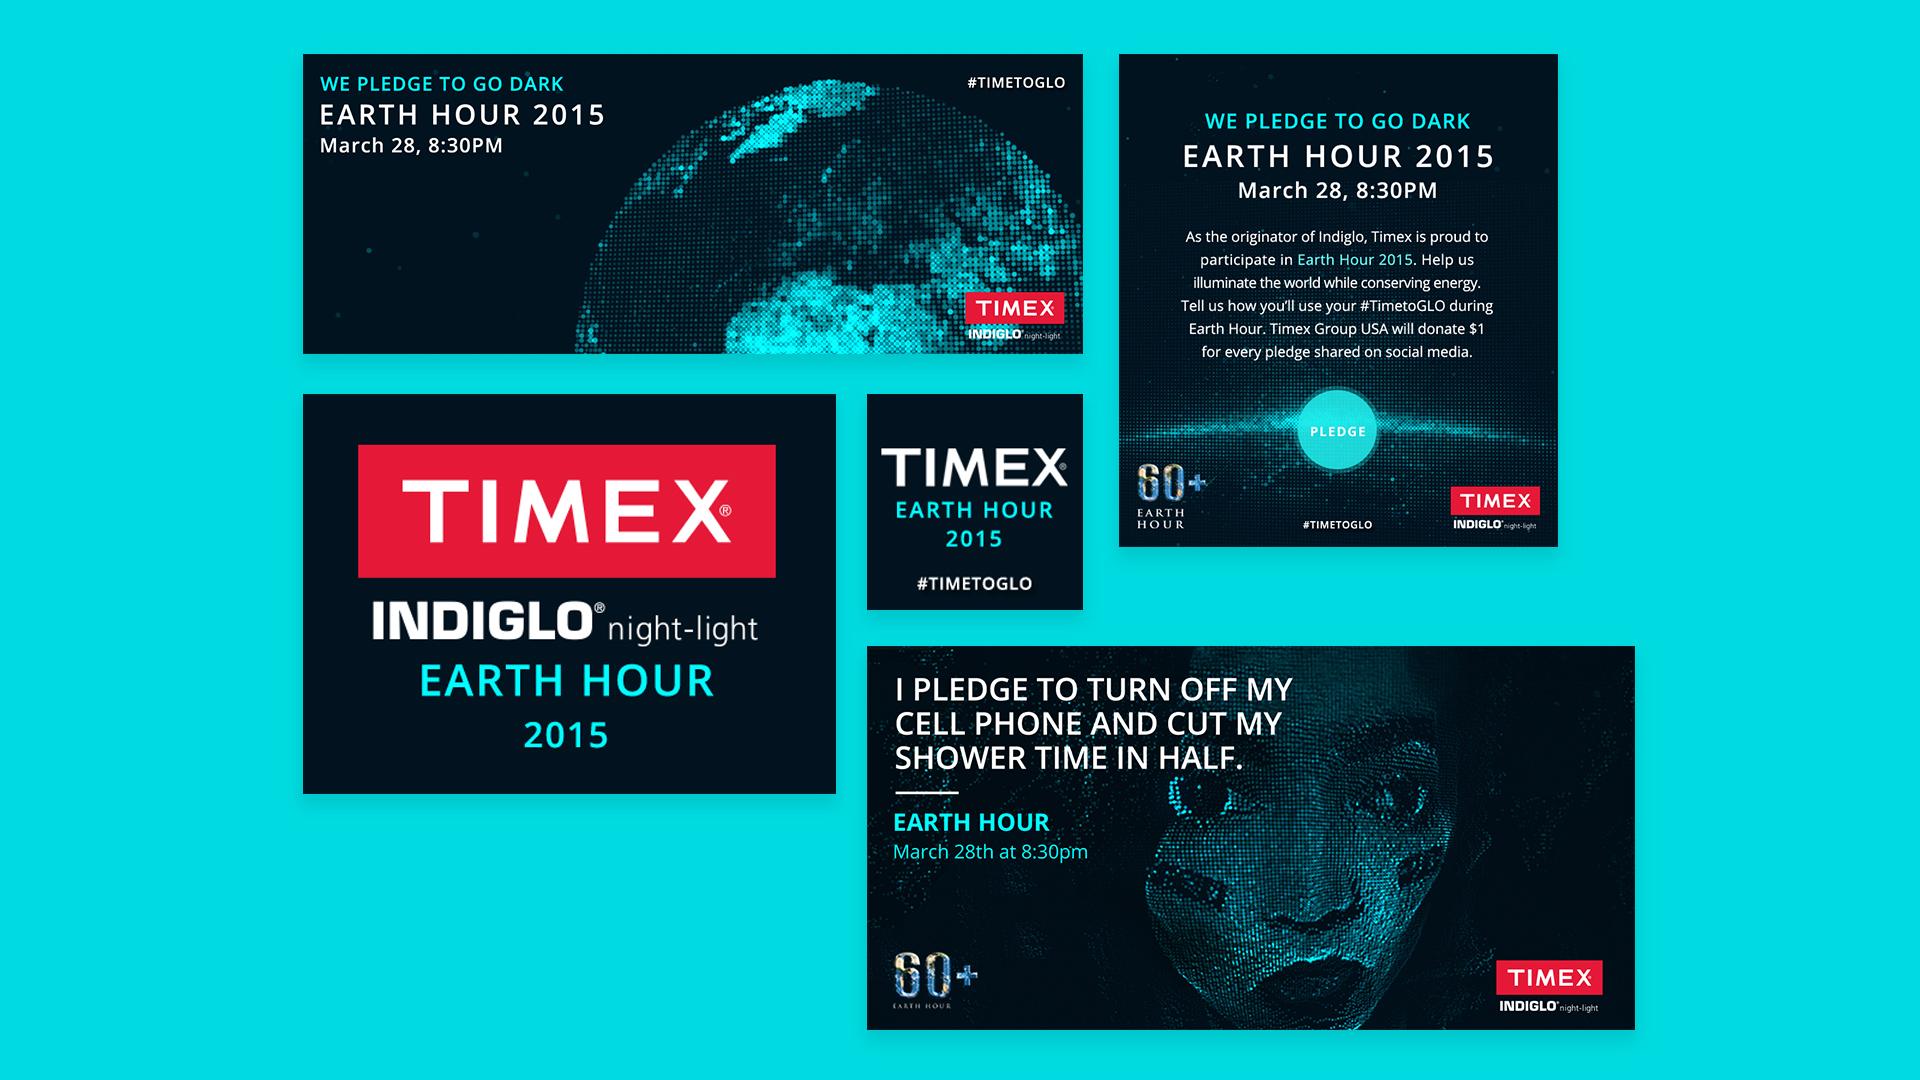 Earth hour 2015 bajibot casetudy001112g malvernweather Choice Image